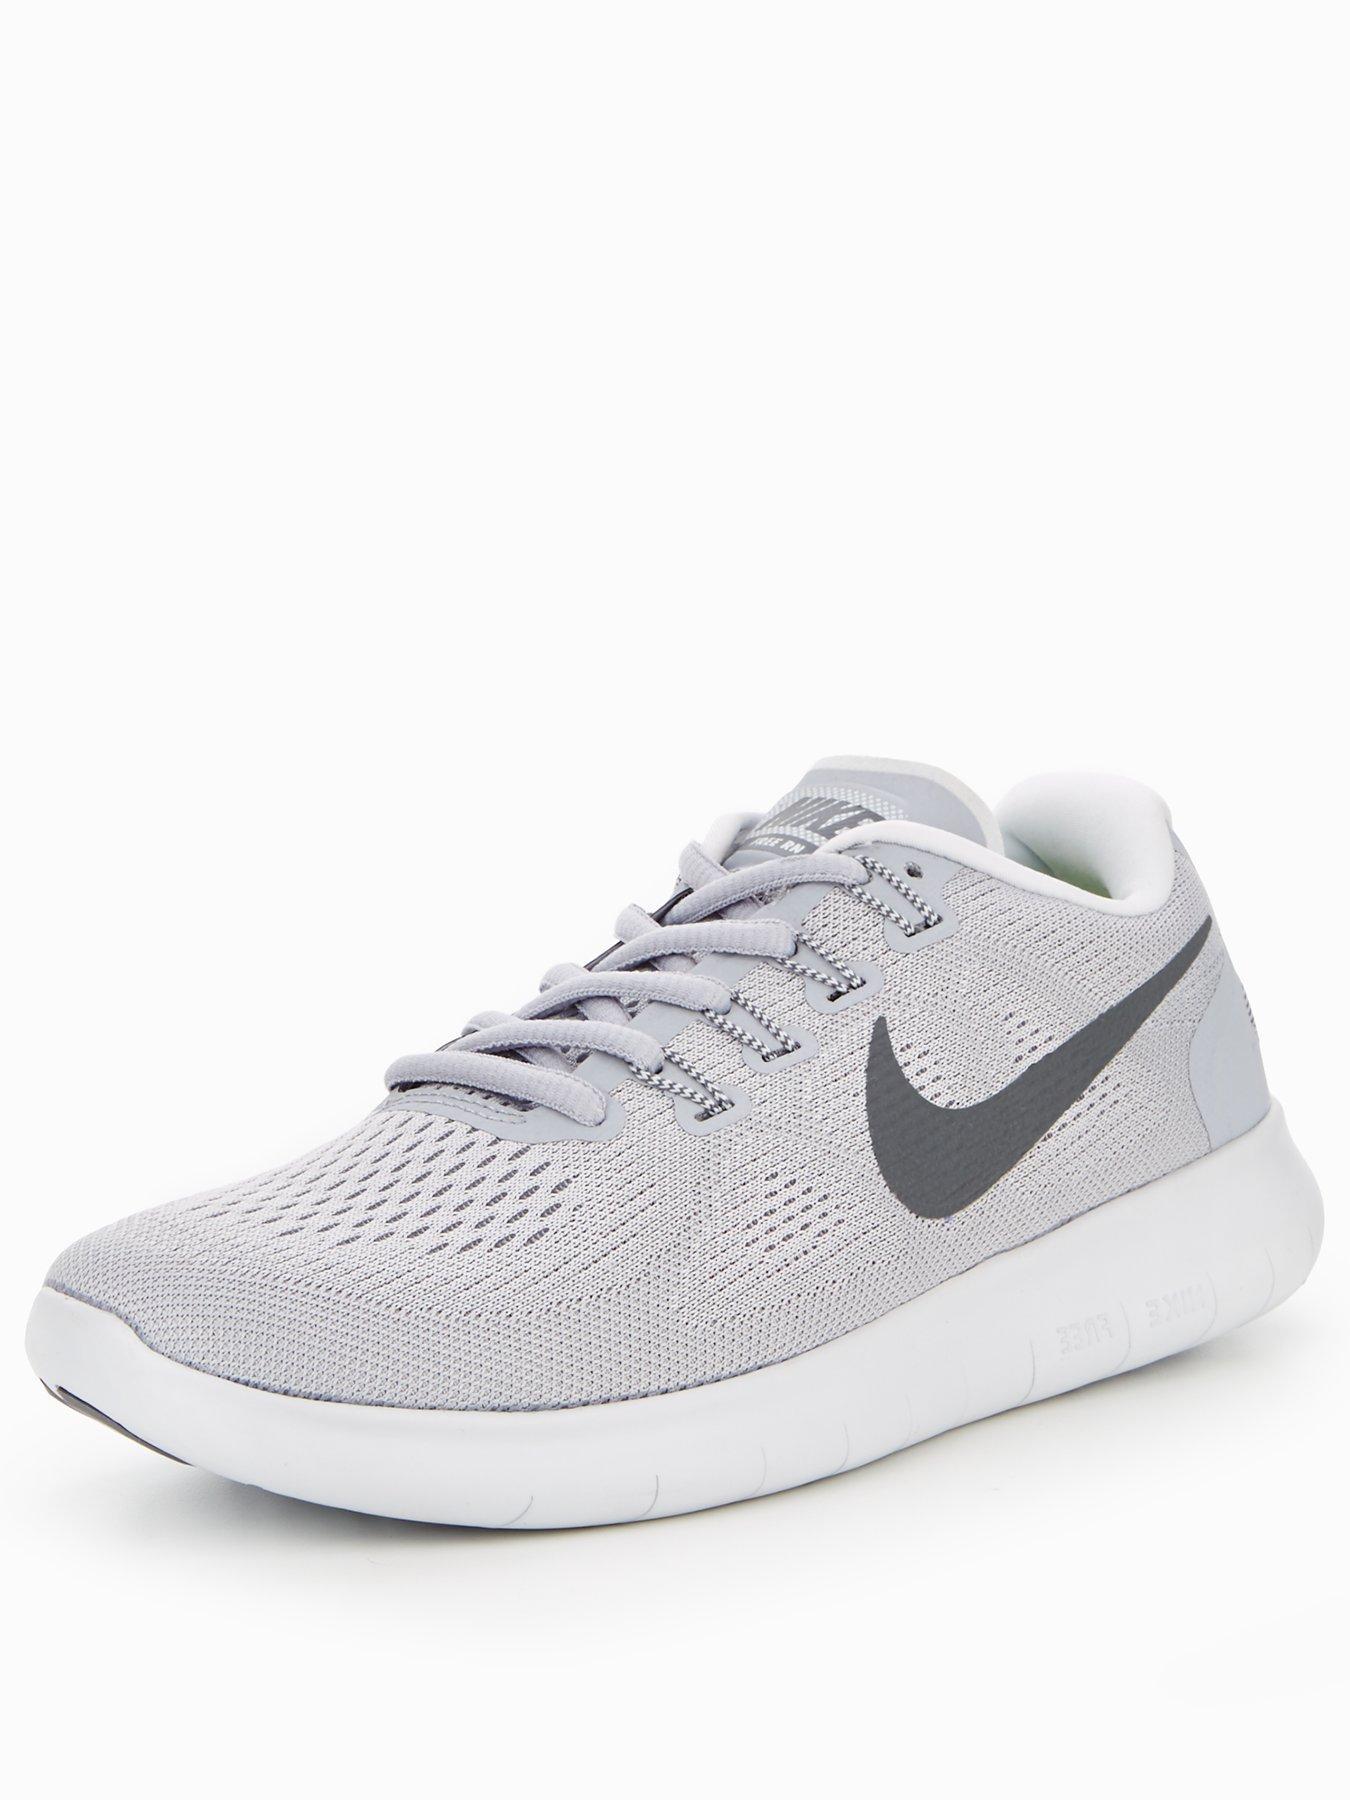 Nike Free RN 2017 Grey 1600179813 Women's Shoes Nike Trainers